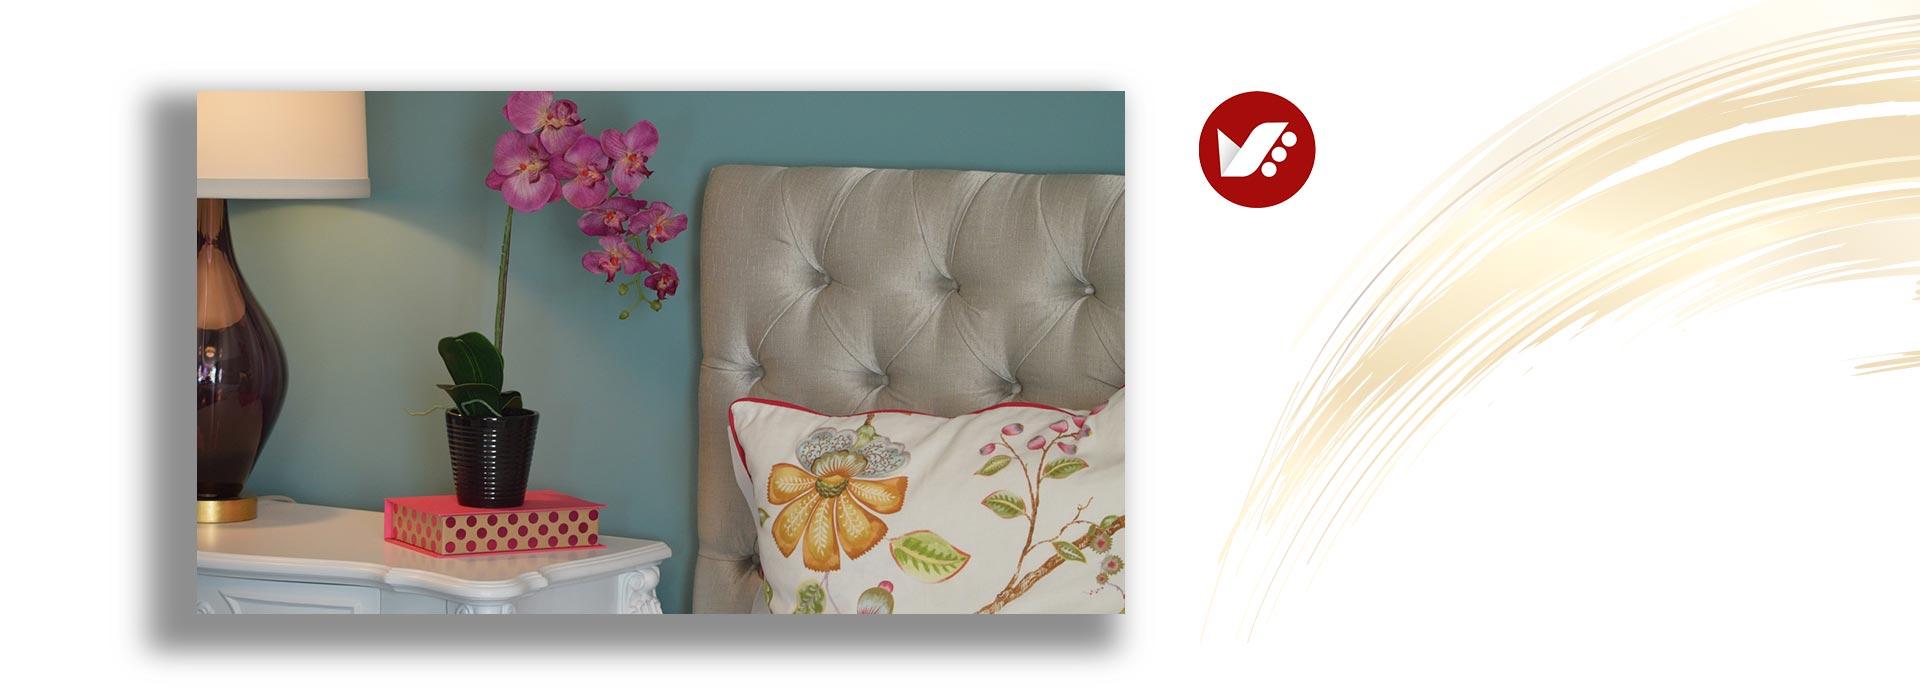 bedroom interior cution - تغییر دکوراسیون اتاق خواب